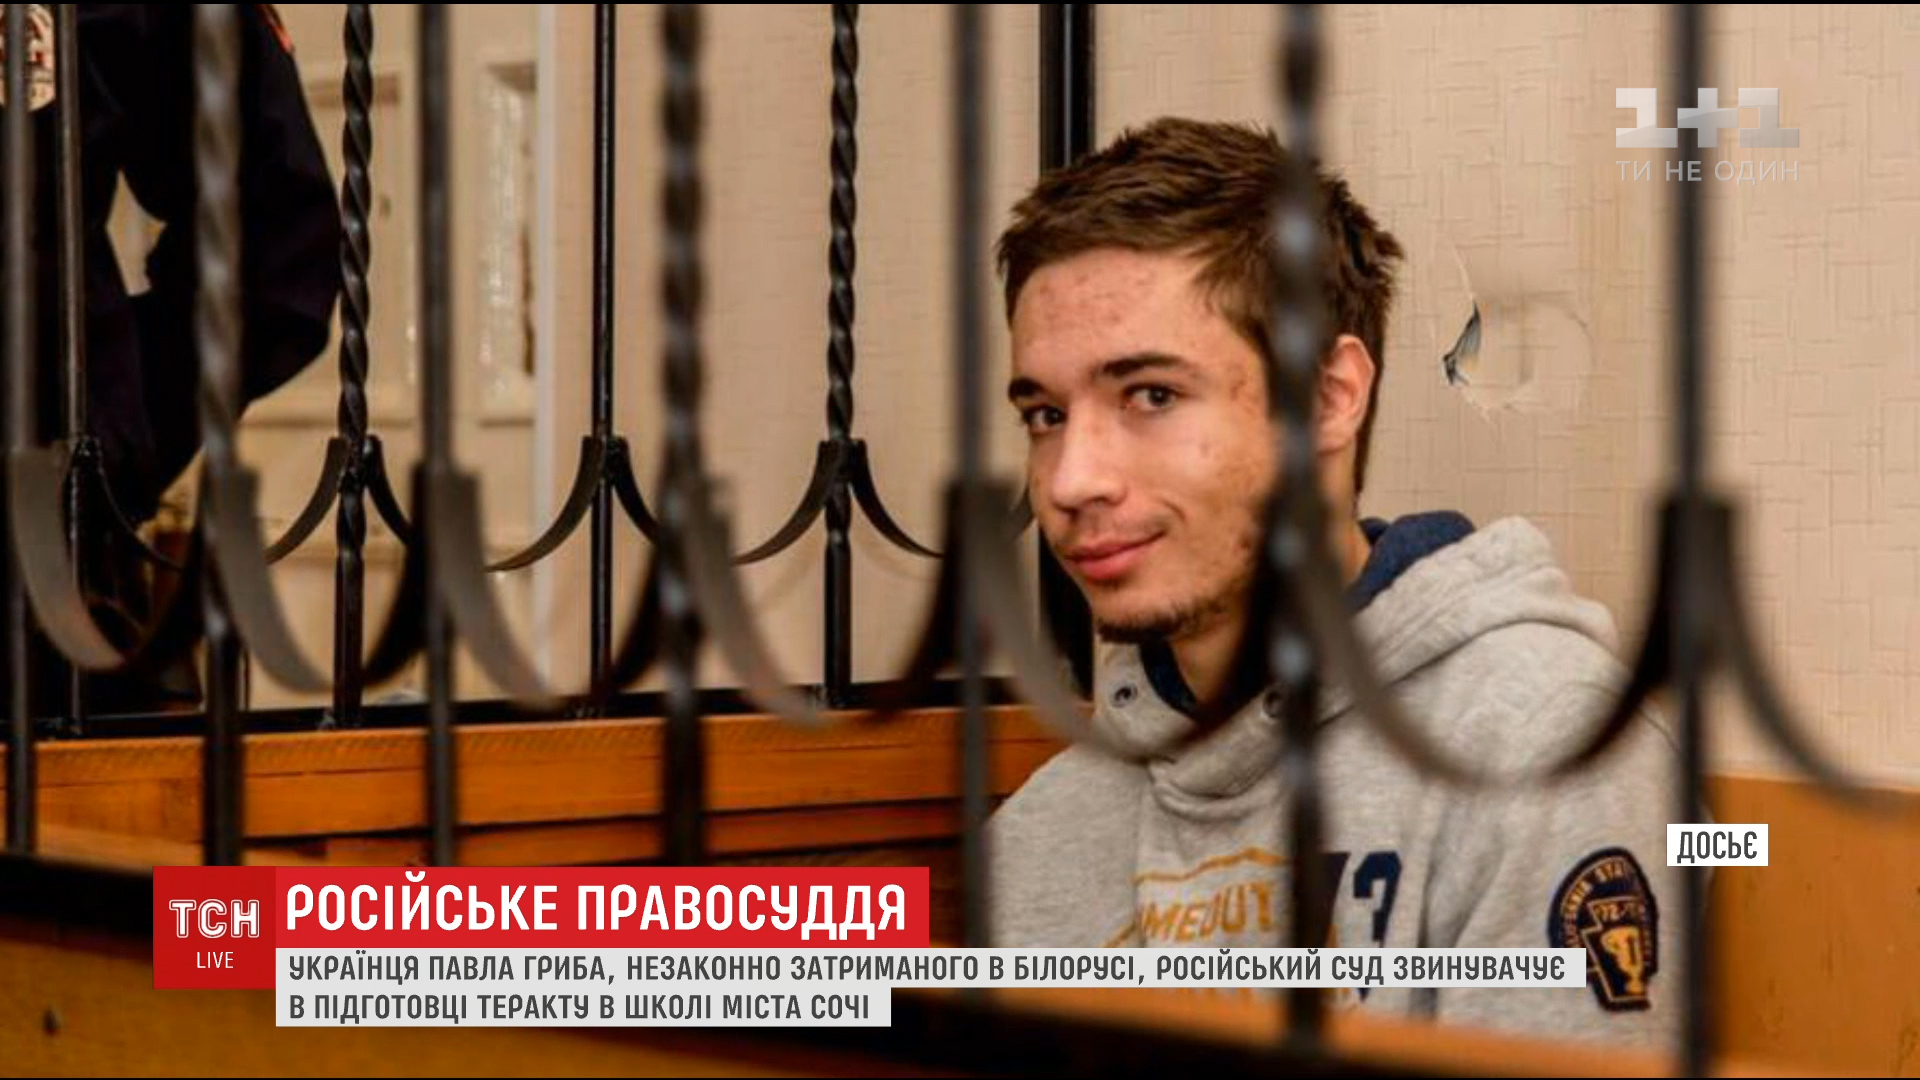 Павел Гриб / Кадр из видео ТСН